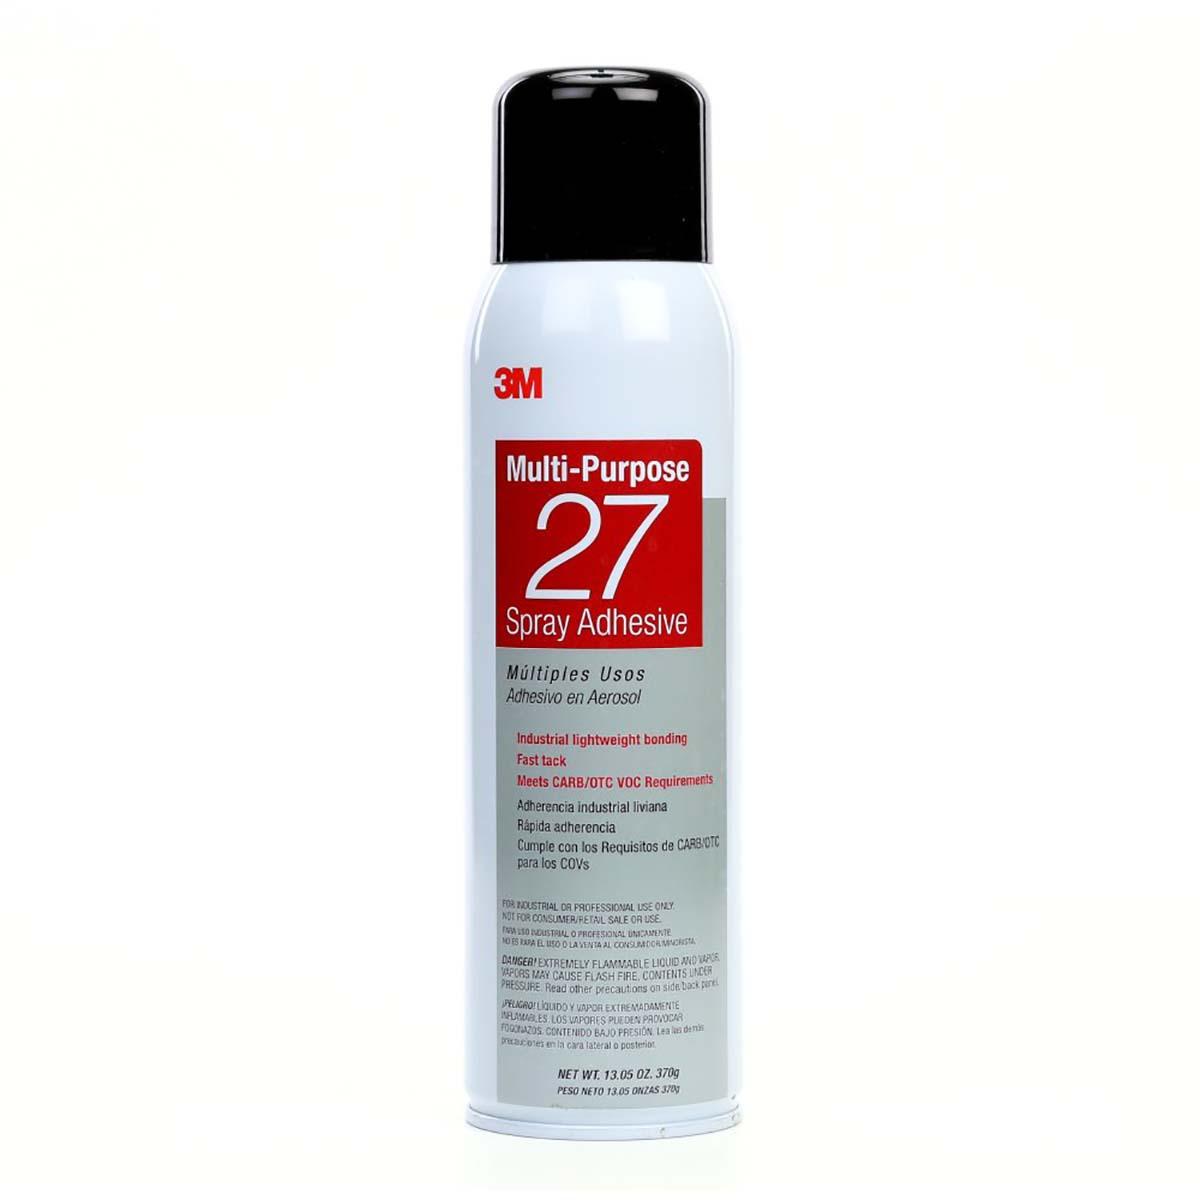 3M Multi-Purpose 27 Spray Adhesive Clear, Net Wt 13.05 oz, 12 cans per case